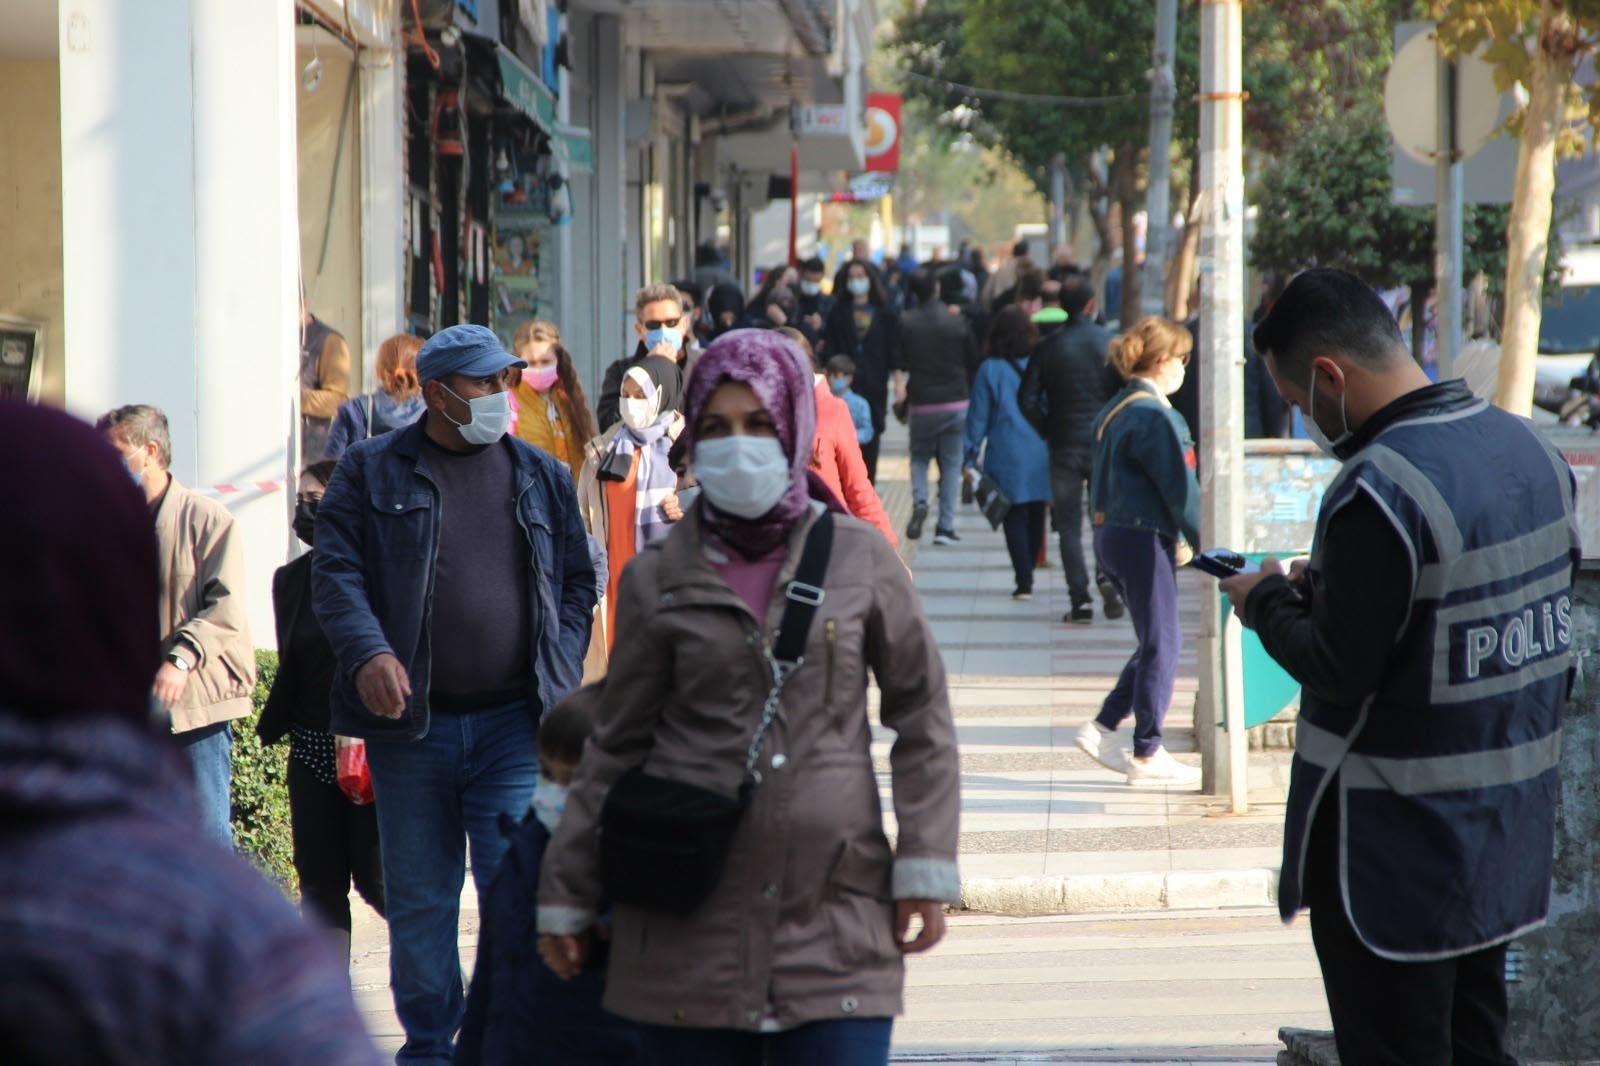 People wearing protective masks walk on a street in Manisa, in western Turkey, Nov. 17, 2020. (DHA Photo)